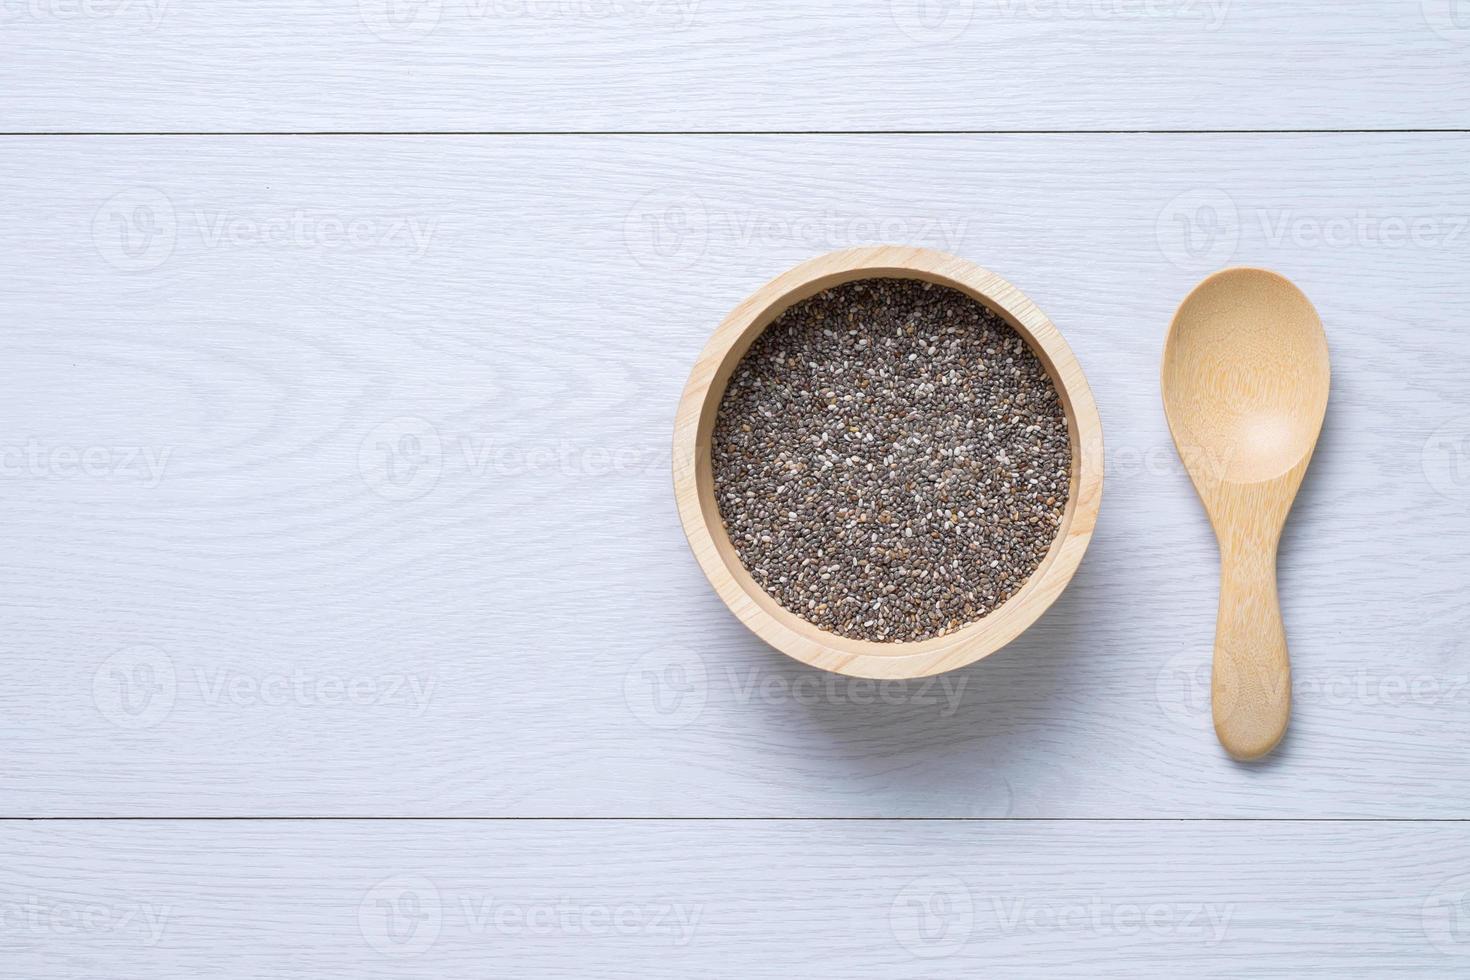 semilla de chai en un tazón de madera foto